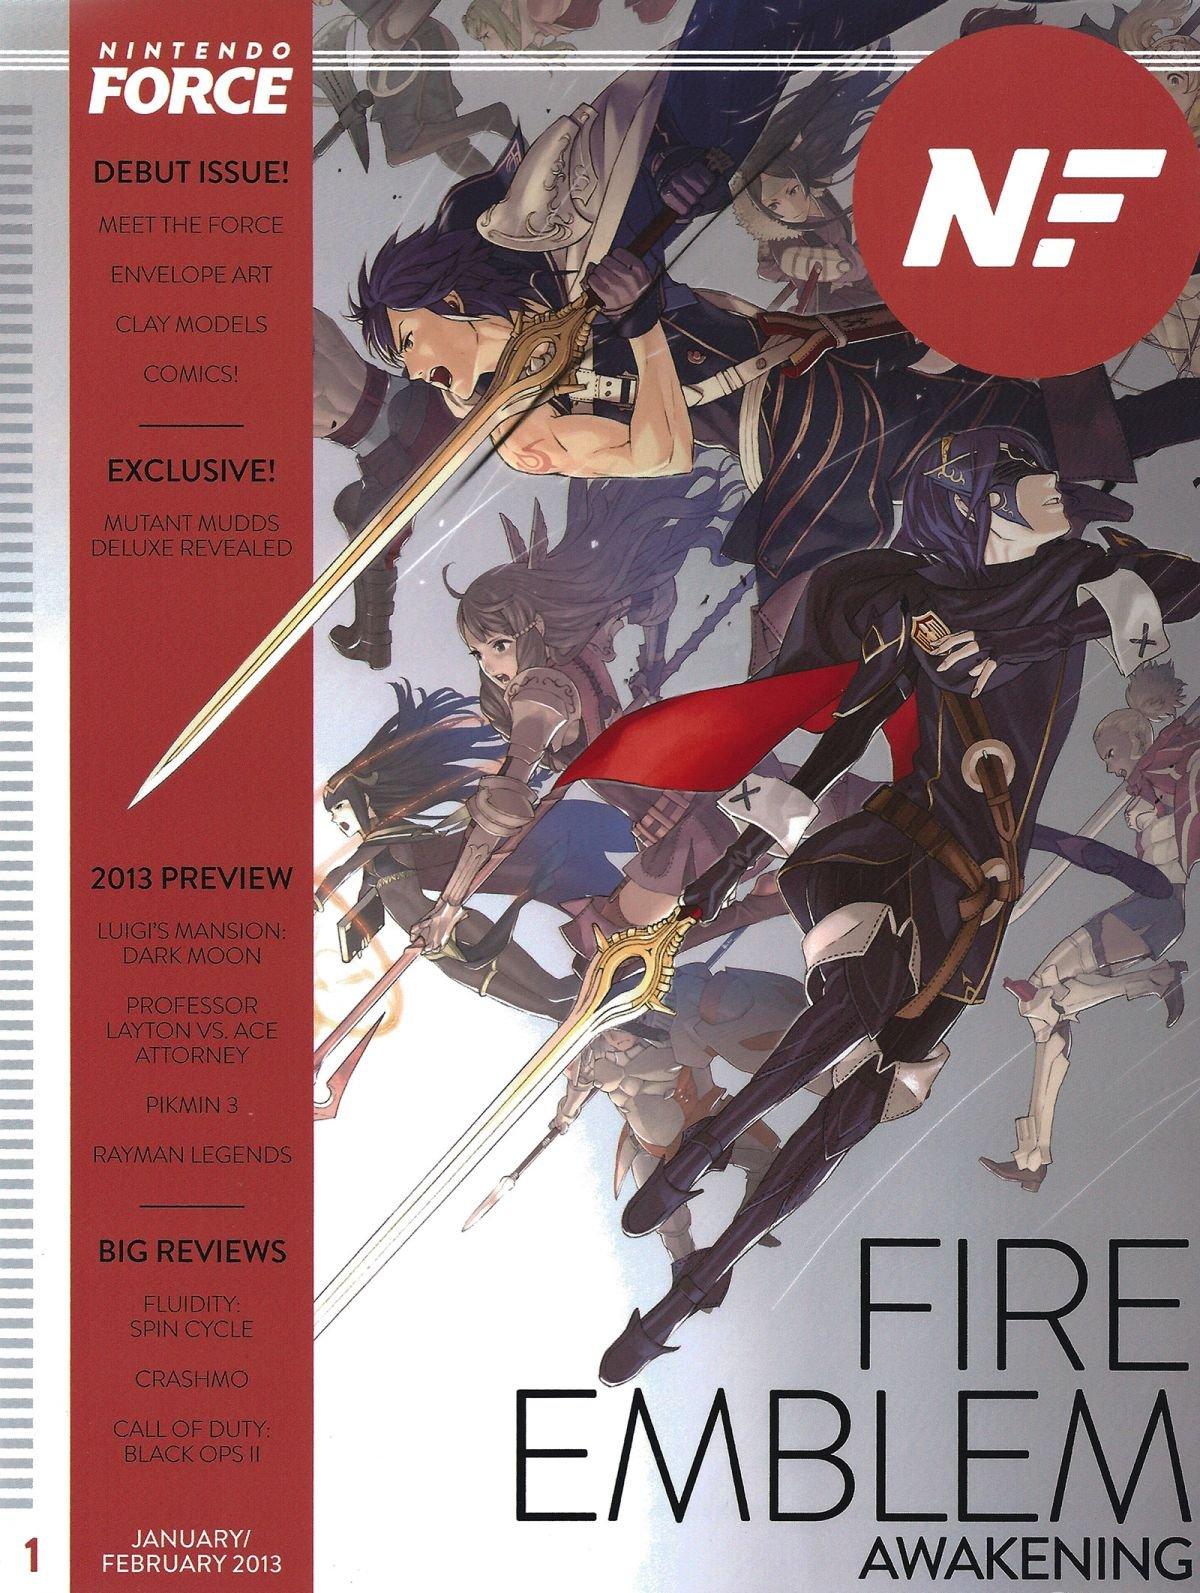 Nintendo Force Issue 01 January/February 2013